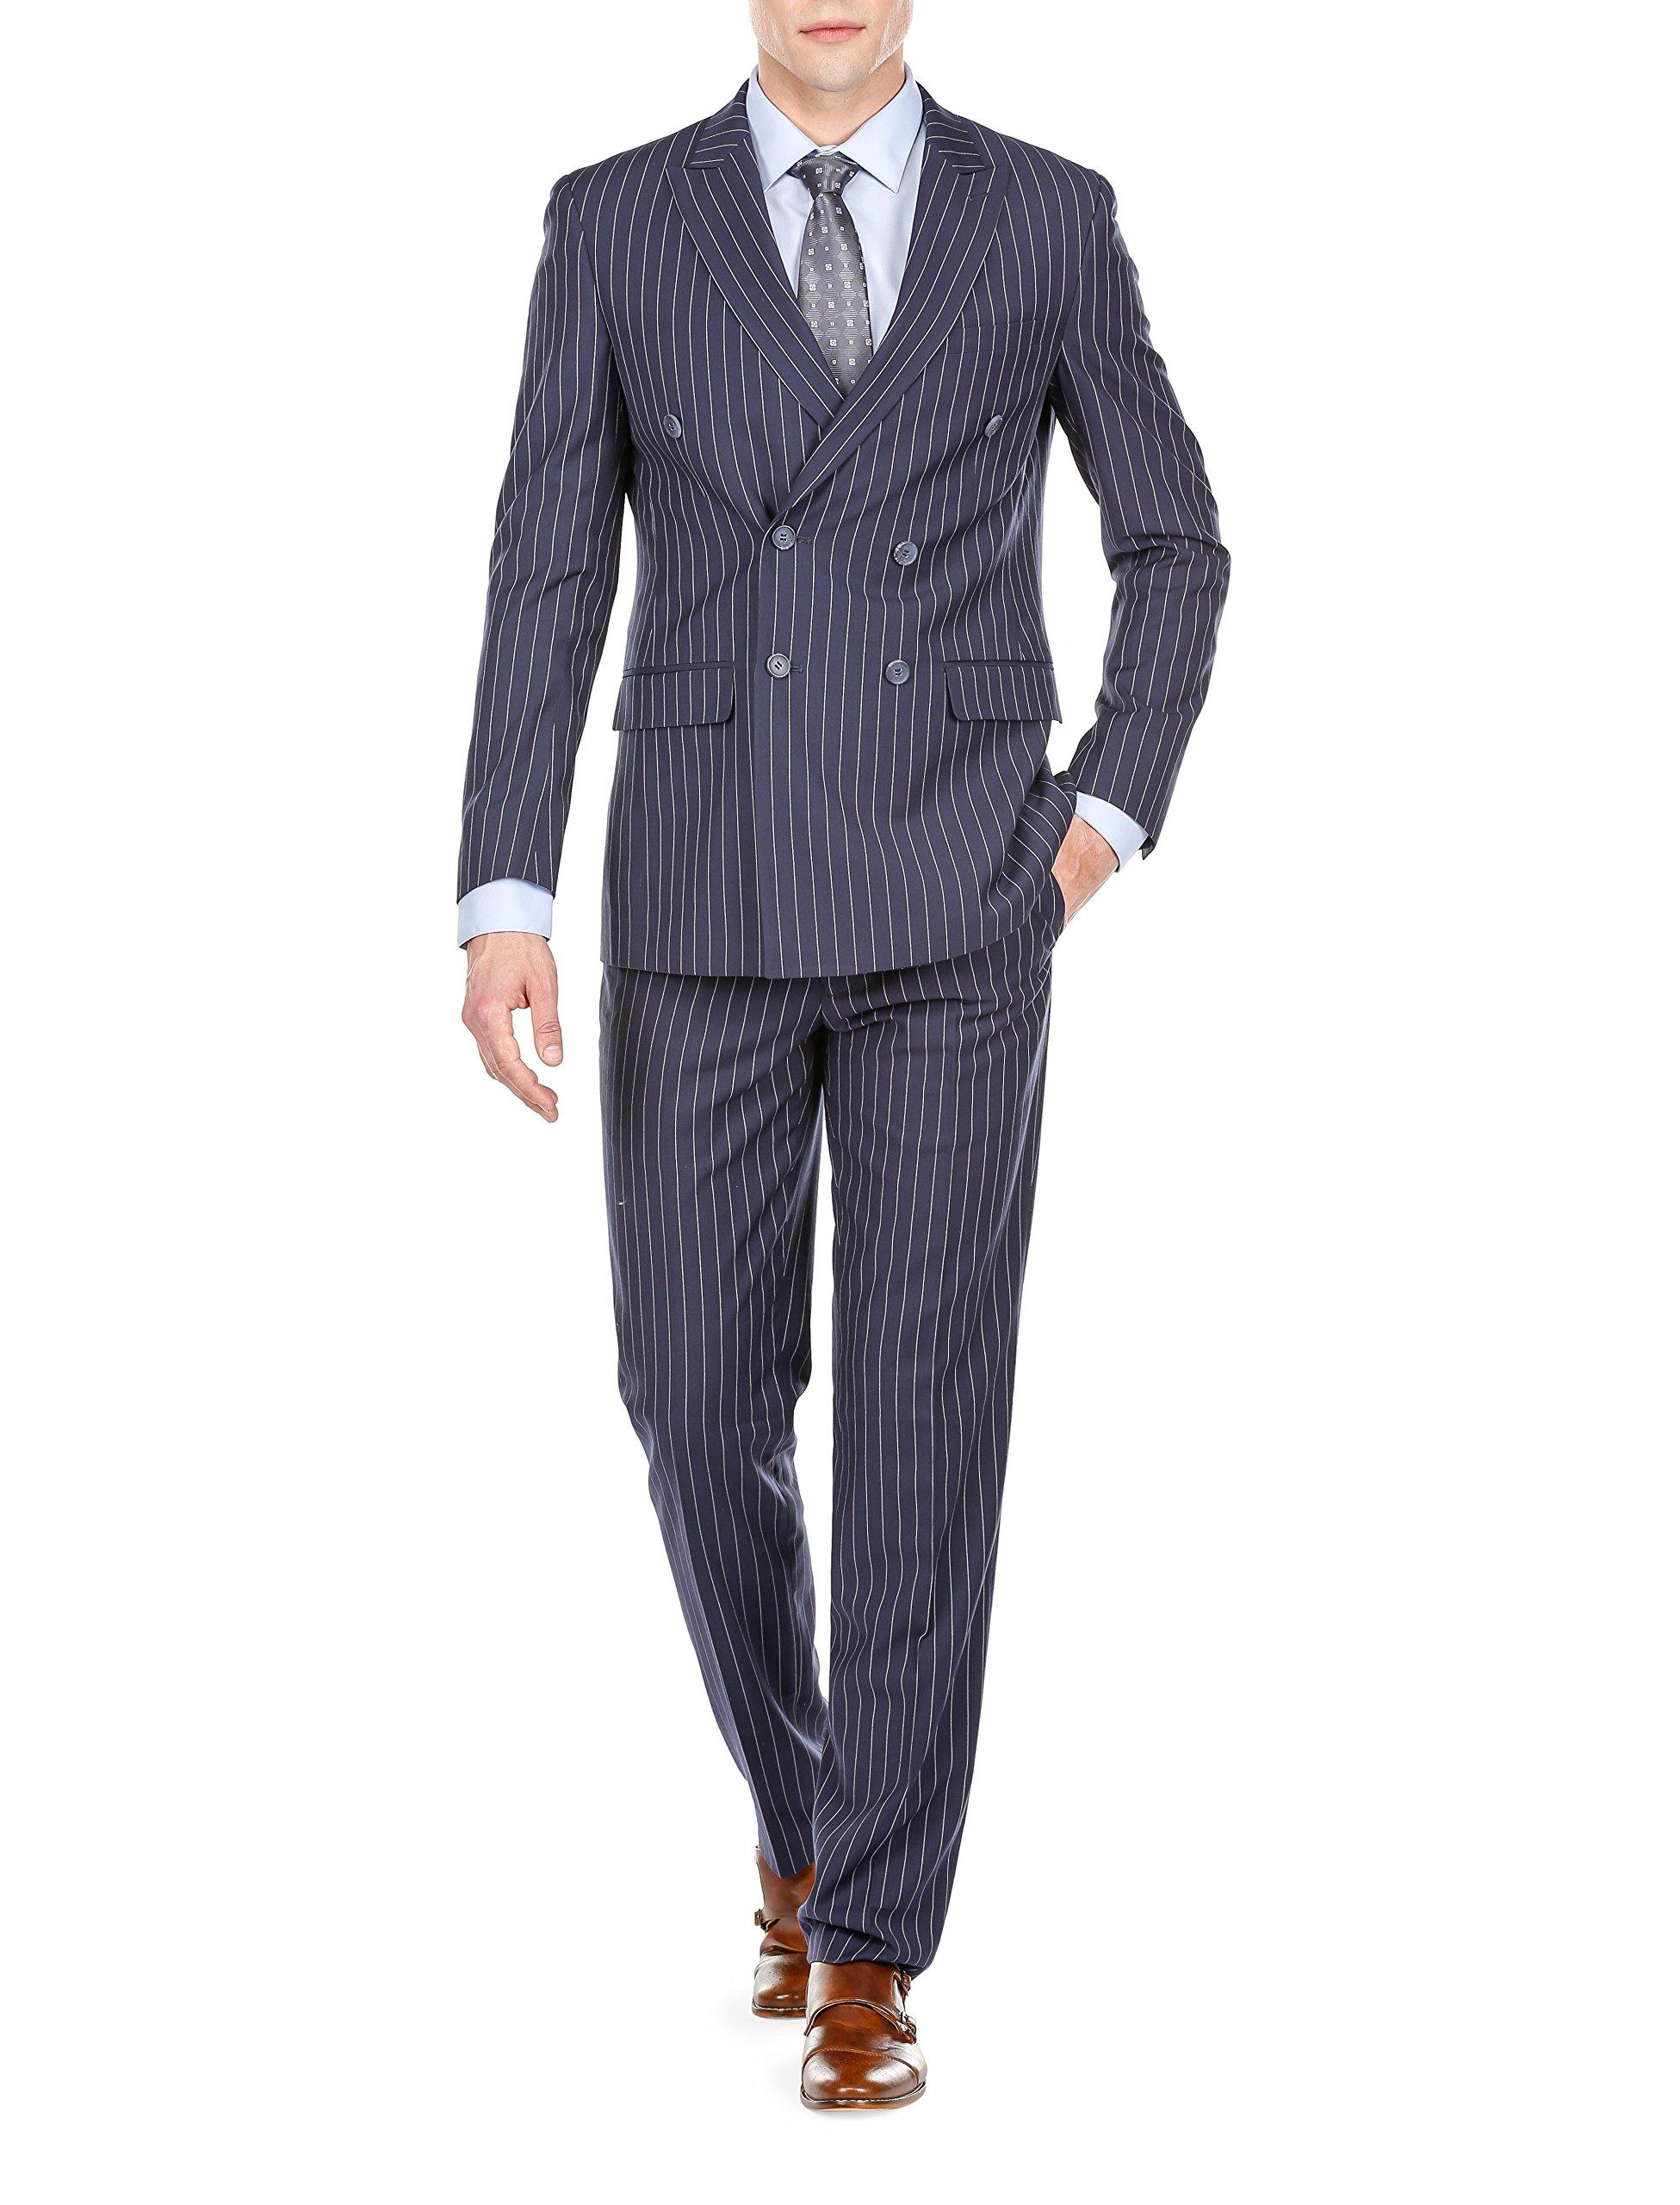 Braveman Men's Slim Fit Bold Stripe Double Breasted Suits, English Blue, Size 44L/38W